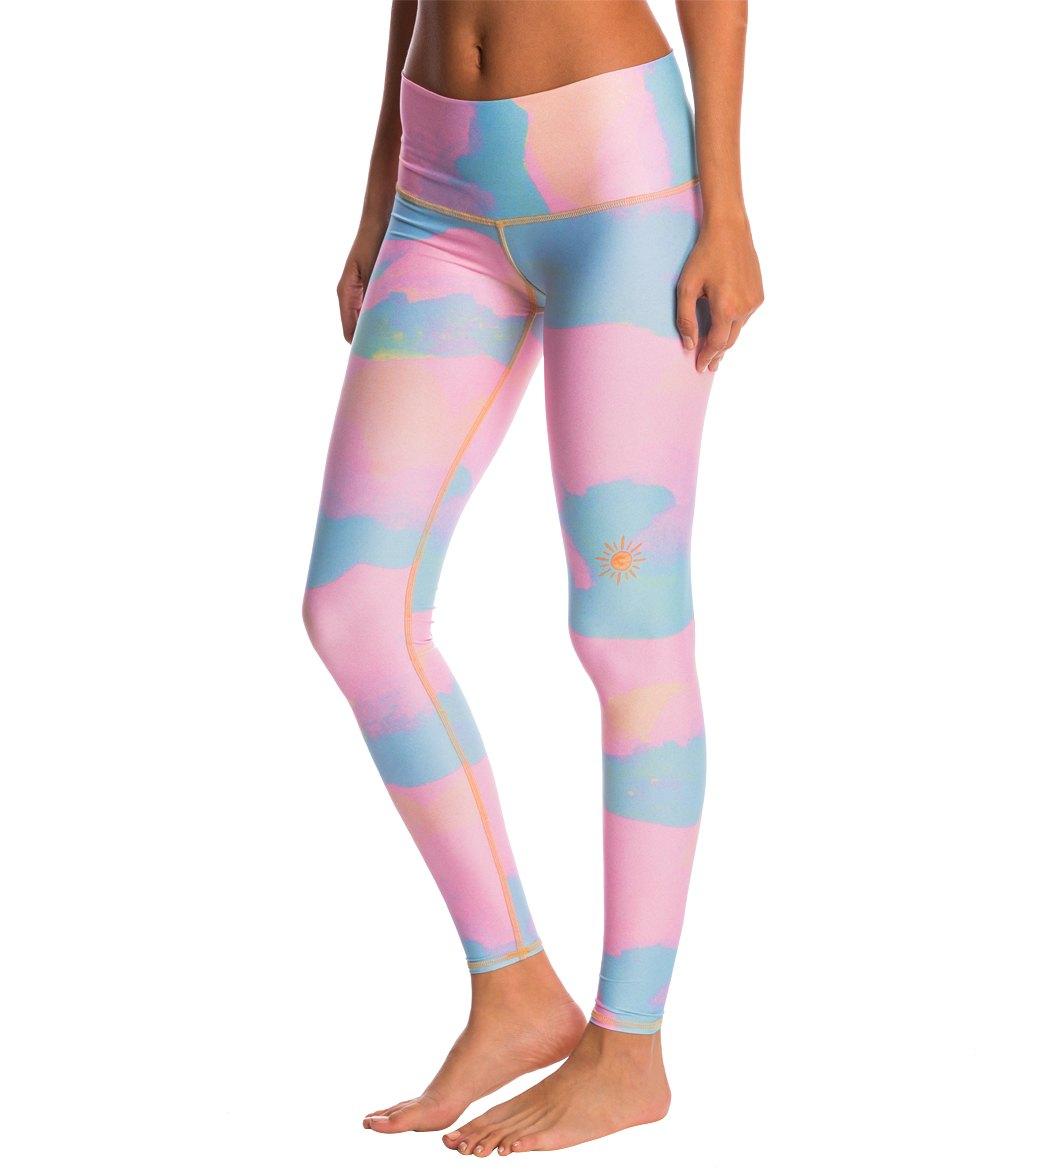 f9929c738171e Teeki New Moon Rainbow Hot Pants at YogaOutlet.com - Free Shipping